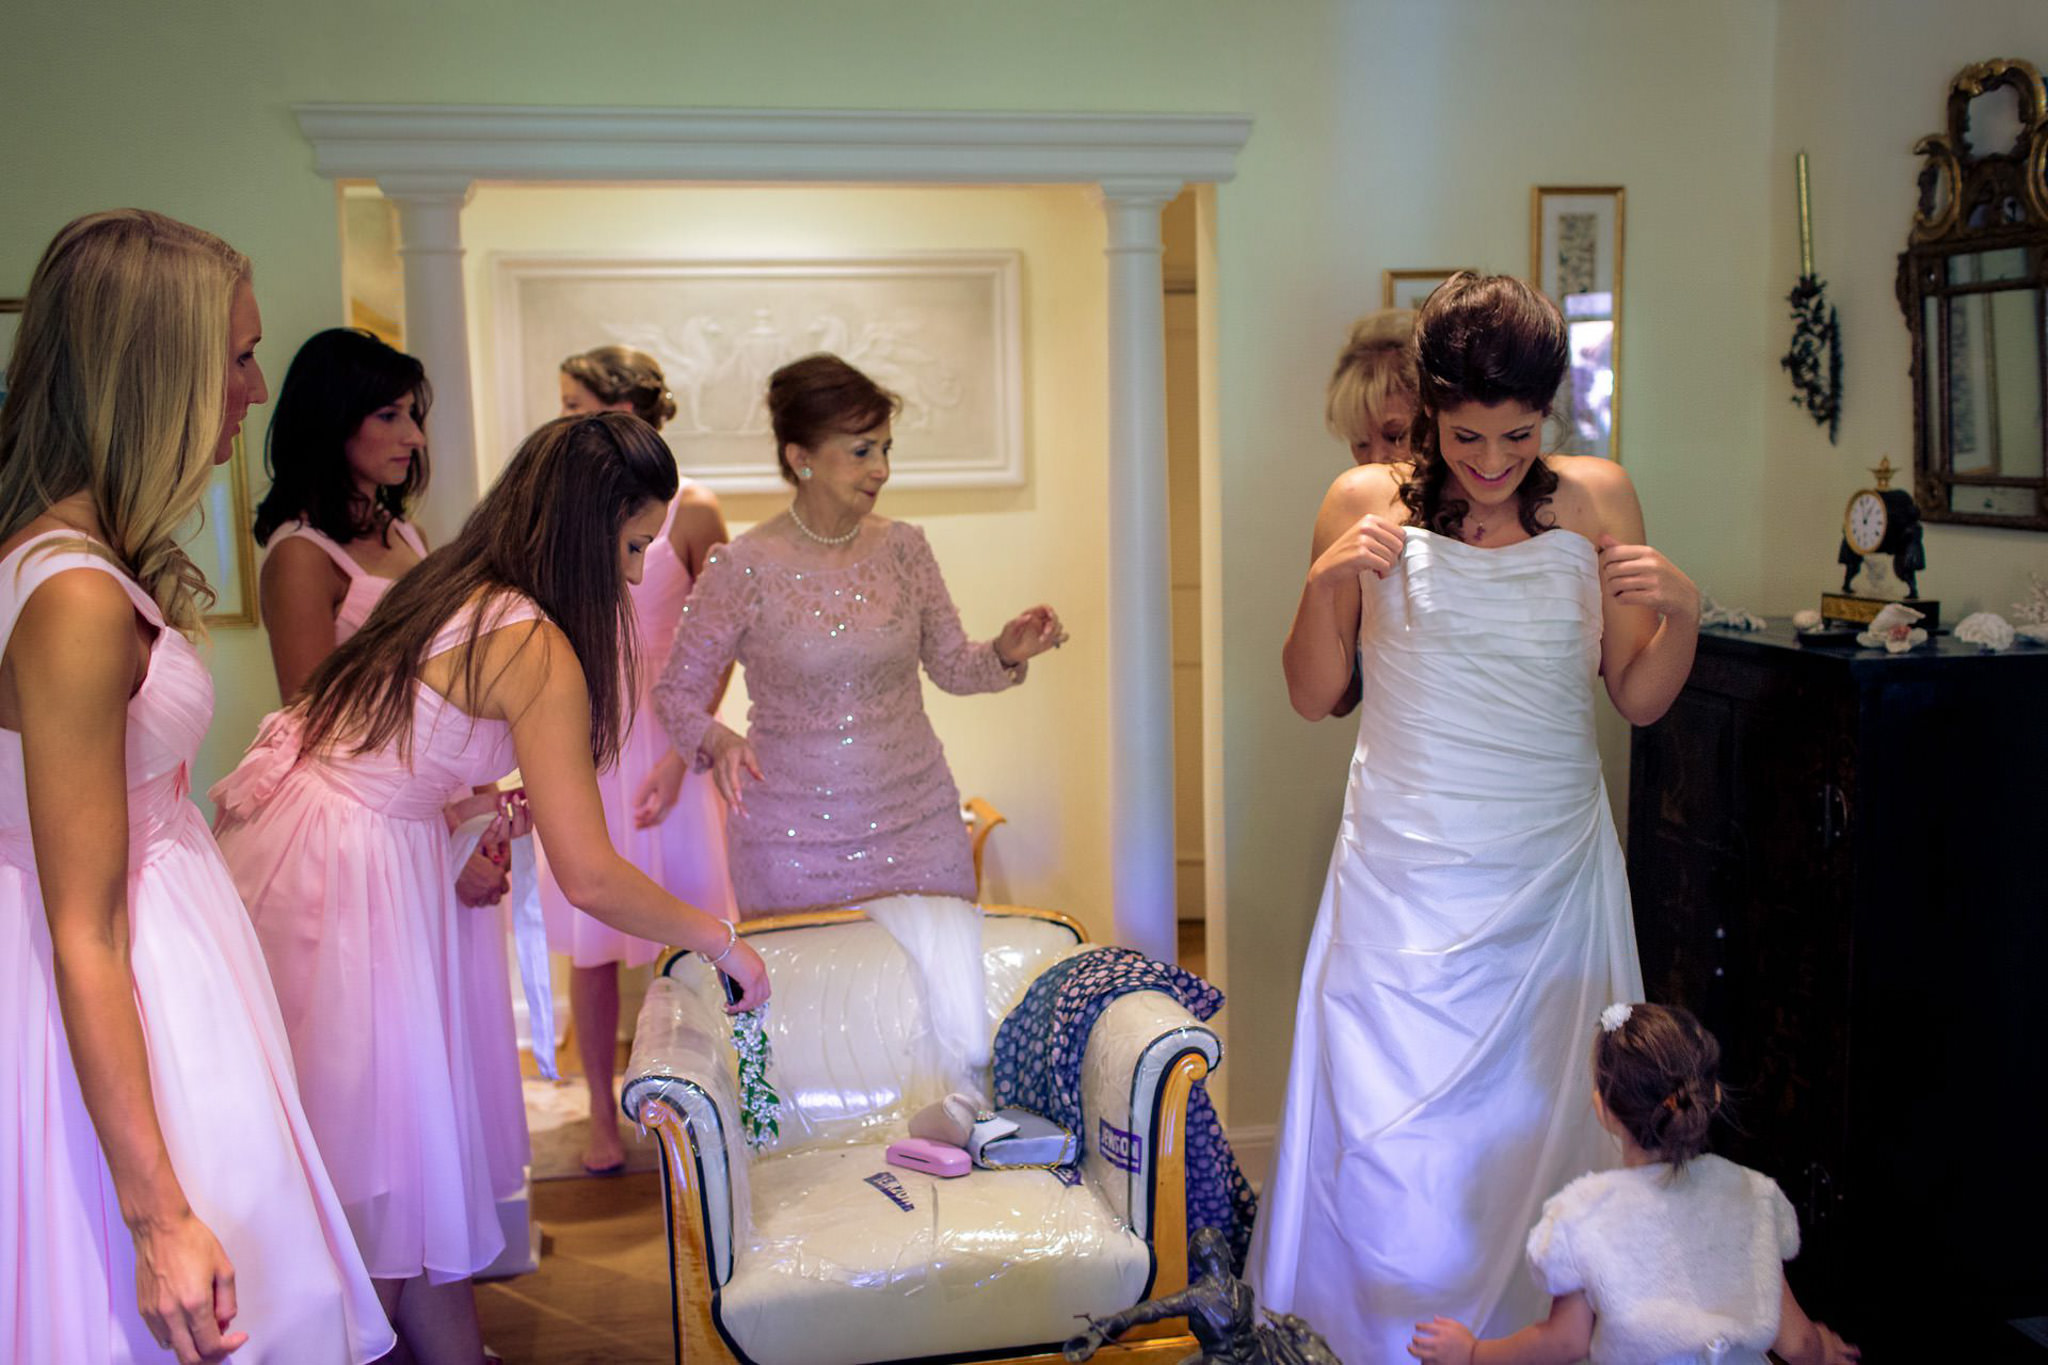 St. Pancras Renaissance hotel wedding bride getting into a dress